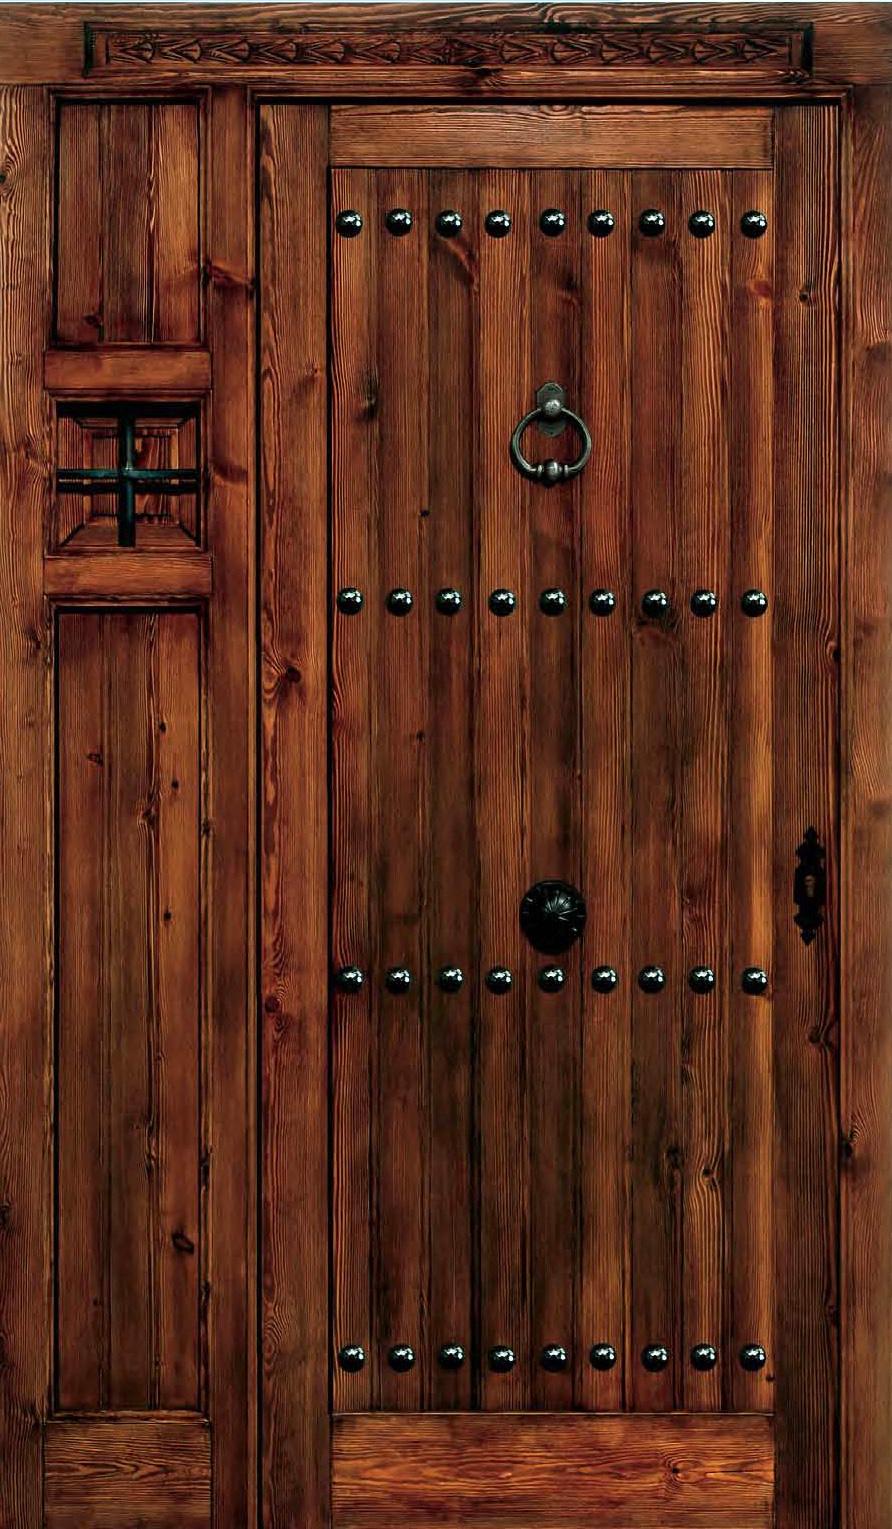 Puertas de madera rusticas stunning with puertas de - Puertas rusticas de madera ...